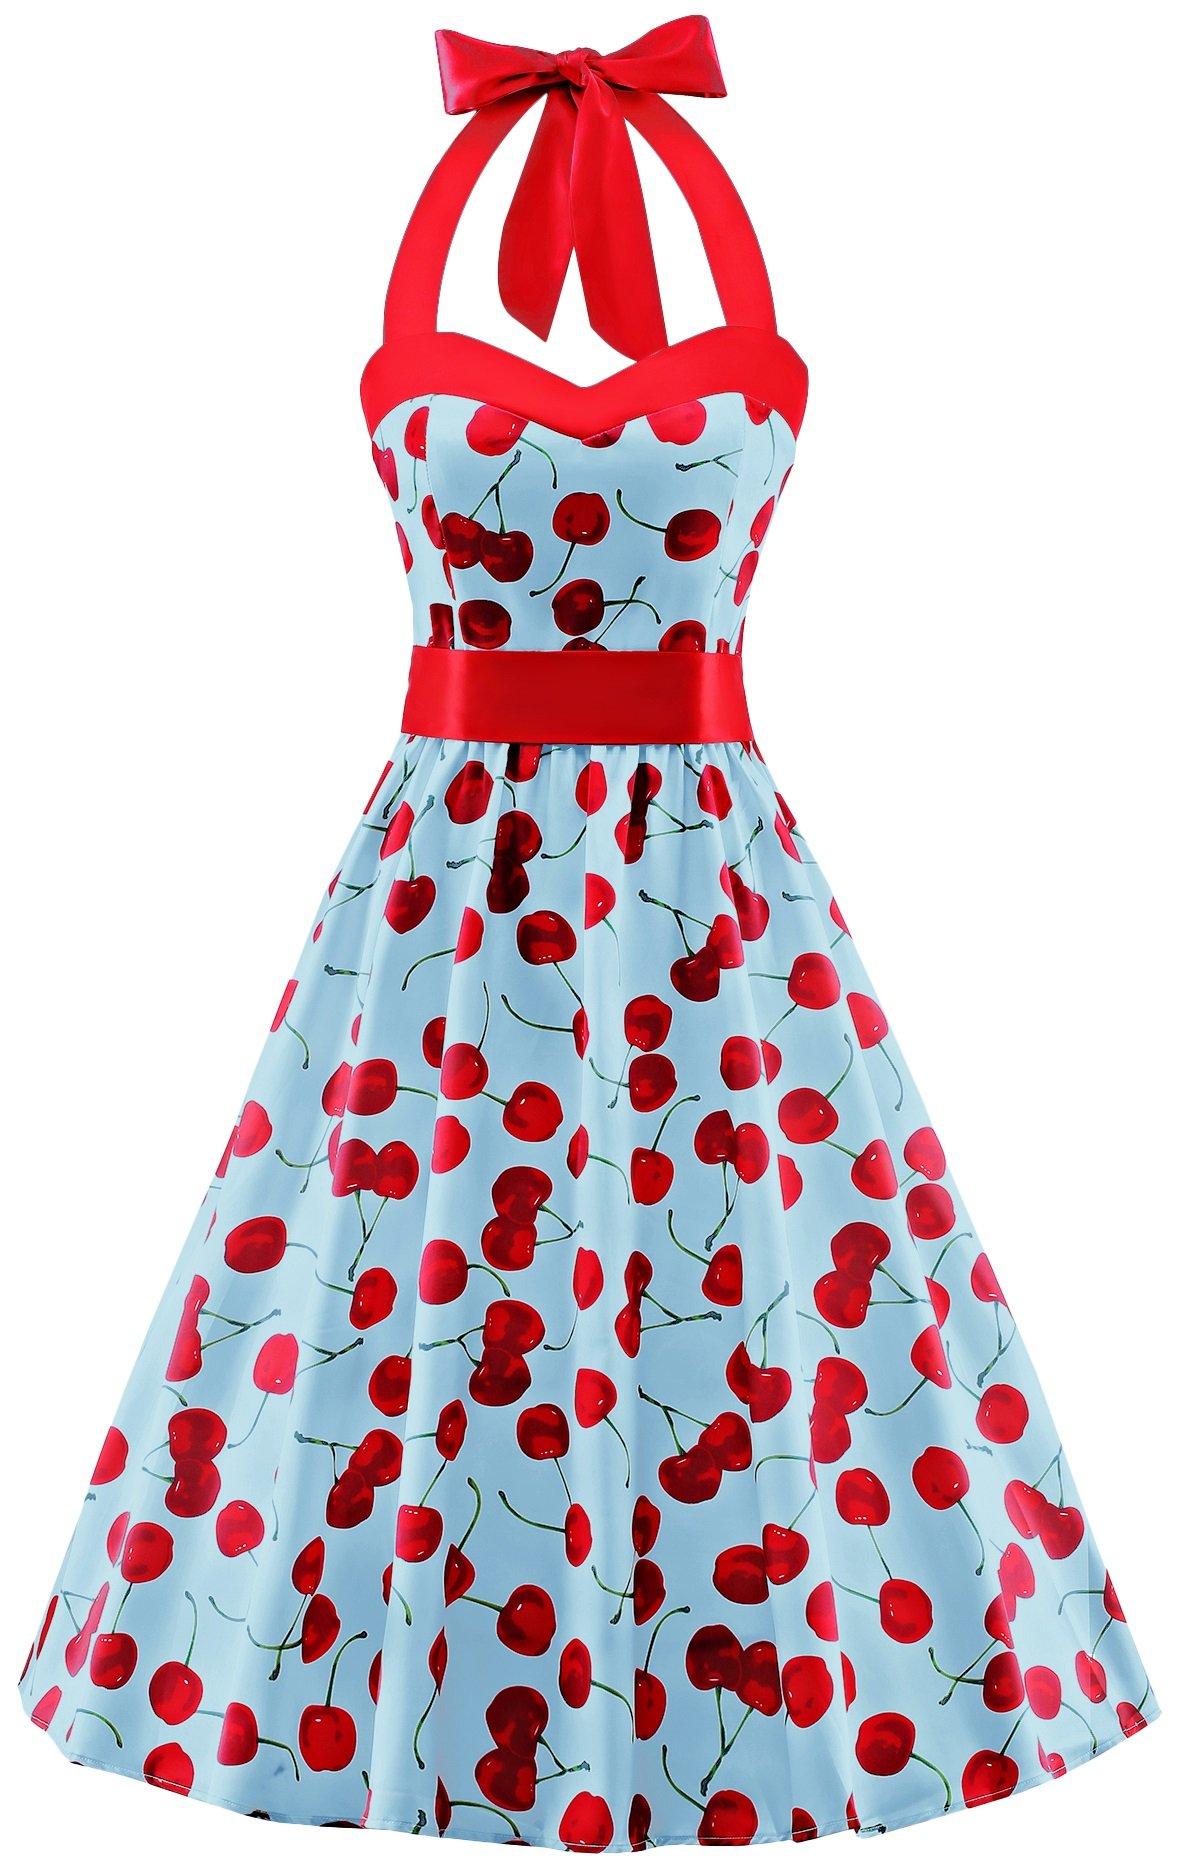 V Fashion 50s Rockabilly Halter Polka Dots Audrey Dress Retro Cocktail Dress Cherry Light Blue 3X